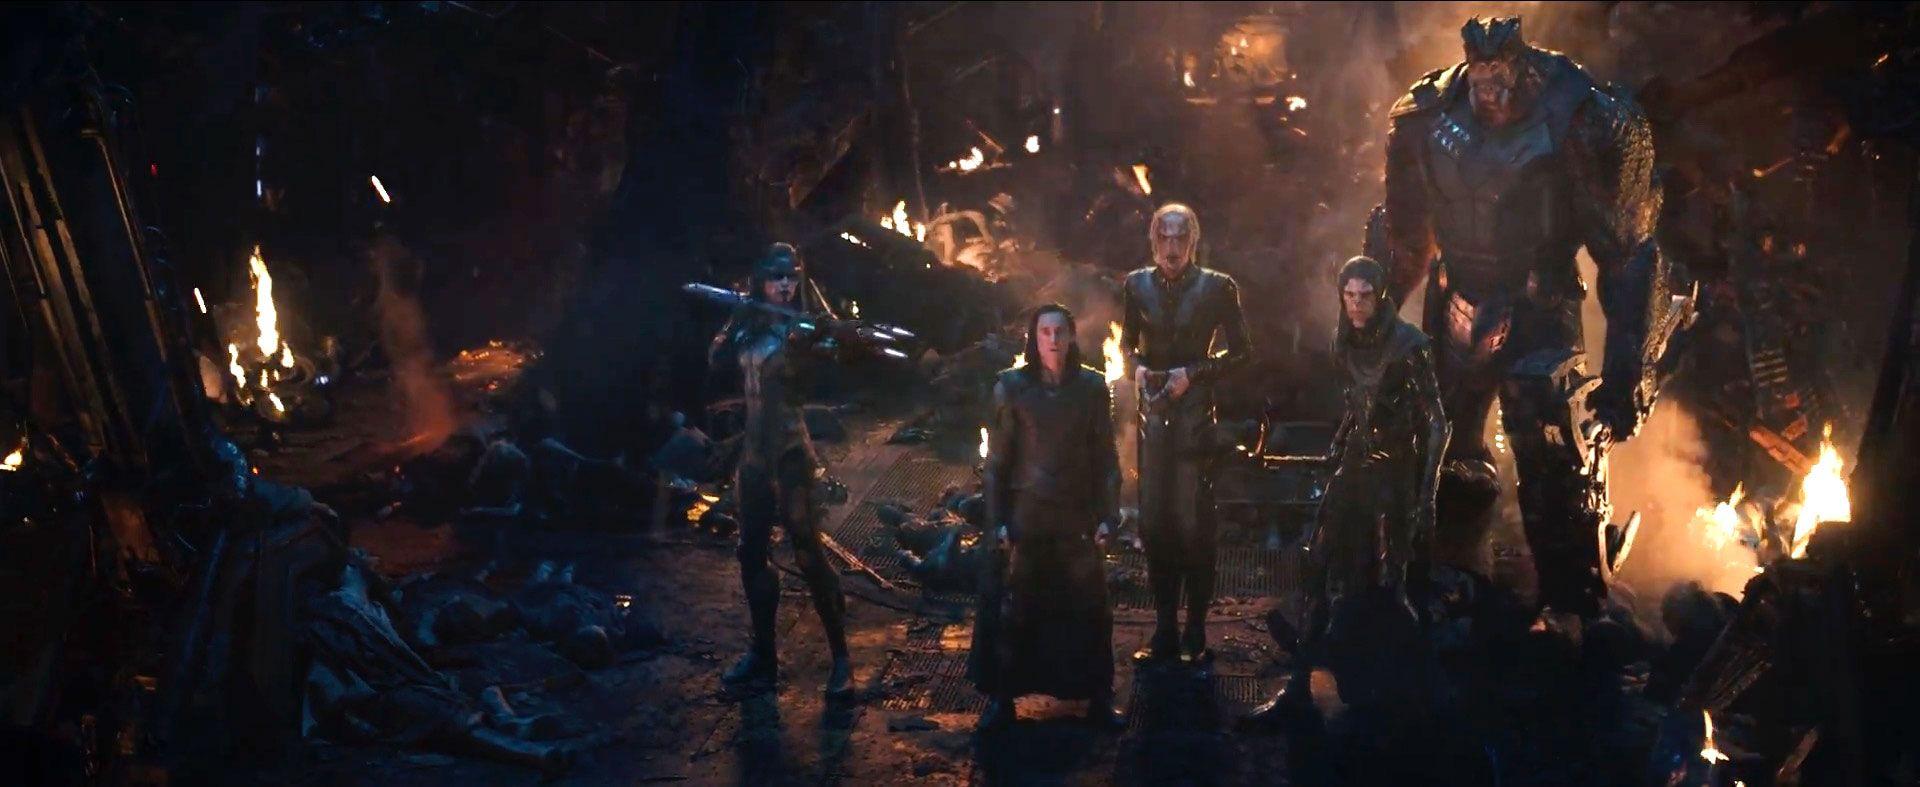 avengers: infinity war villains explained